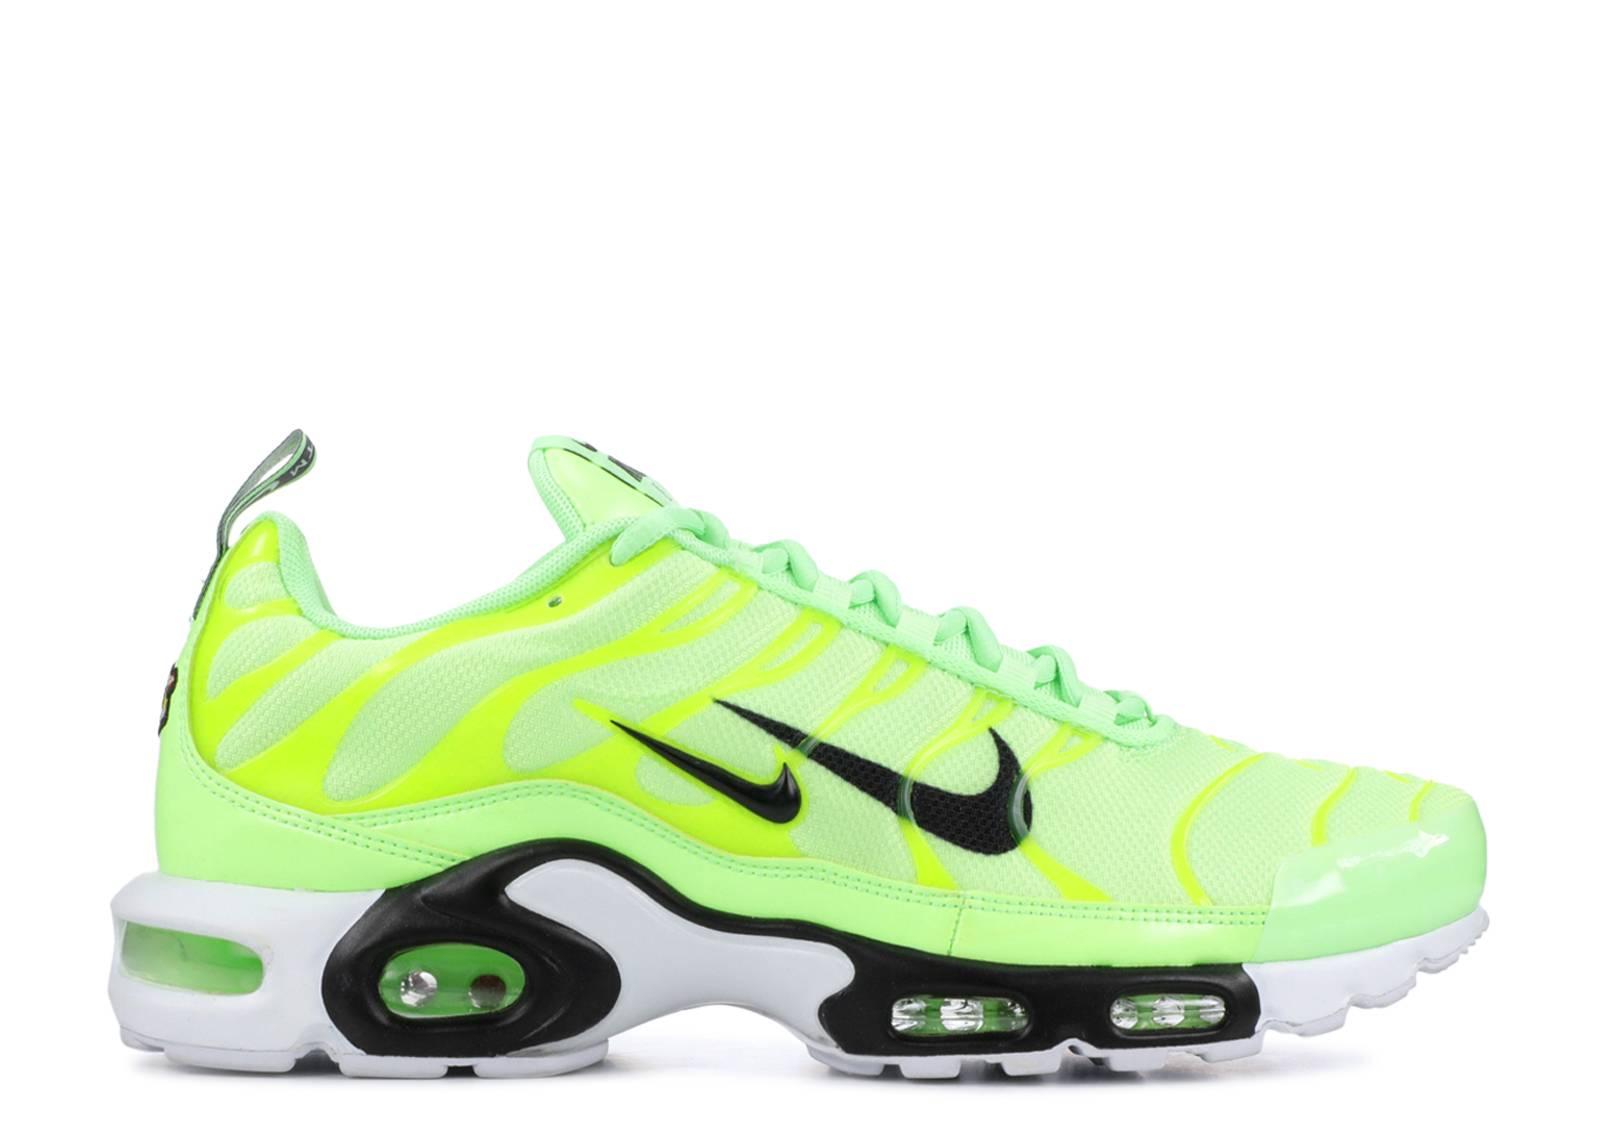 wholesale dealer 1be8f 2445f Nike Air Max Plus Premium 'Overbranding - Lime Blast'